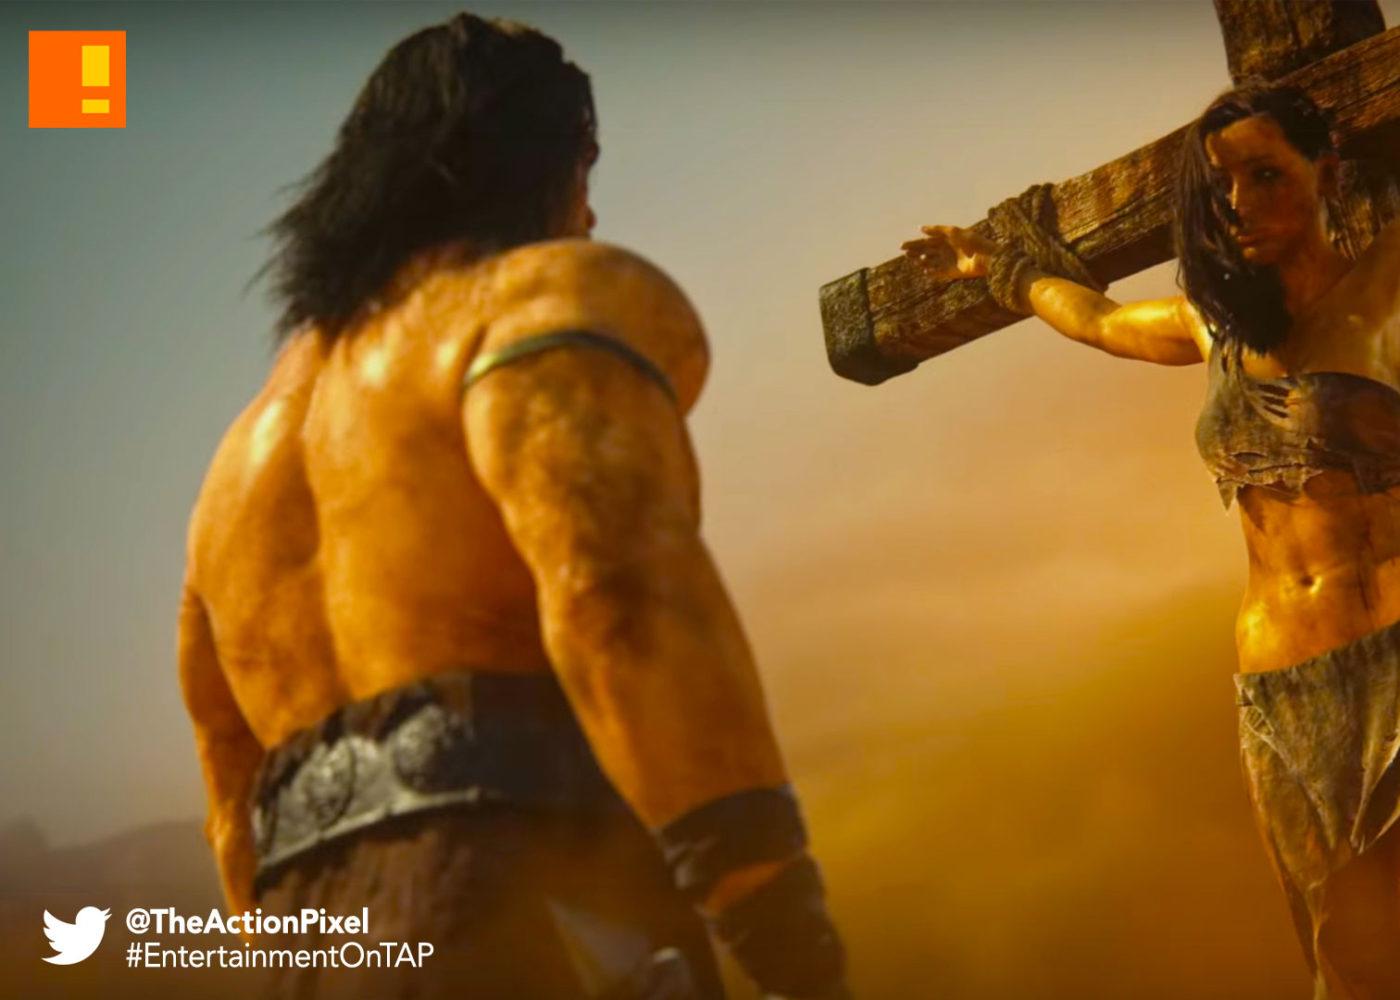 conan exiles, funcom, the action pixel, @theactionpixel, opening cinematic trailer, cinematic, trailer, conan, savage, barbarian, conan the barbarian, sandbox, open world,